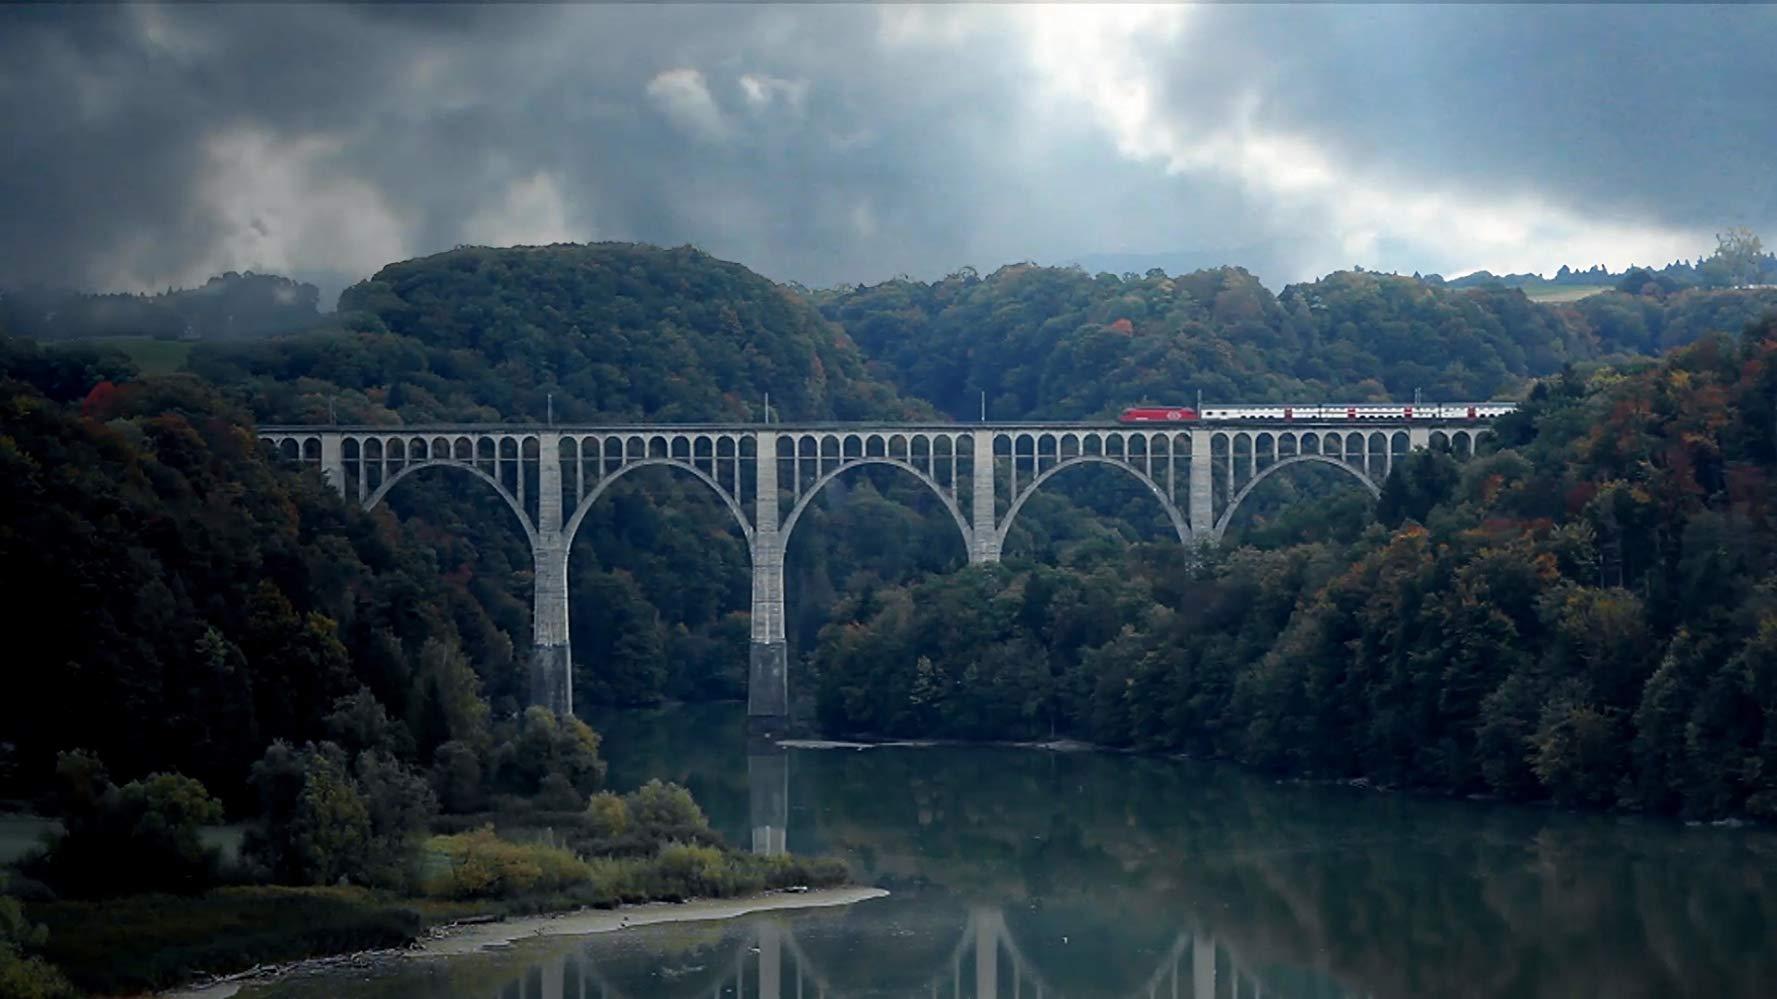 مشاهدة فيلم Beyond the Bridge 2015 HD مترجم كامل اون لاين